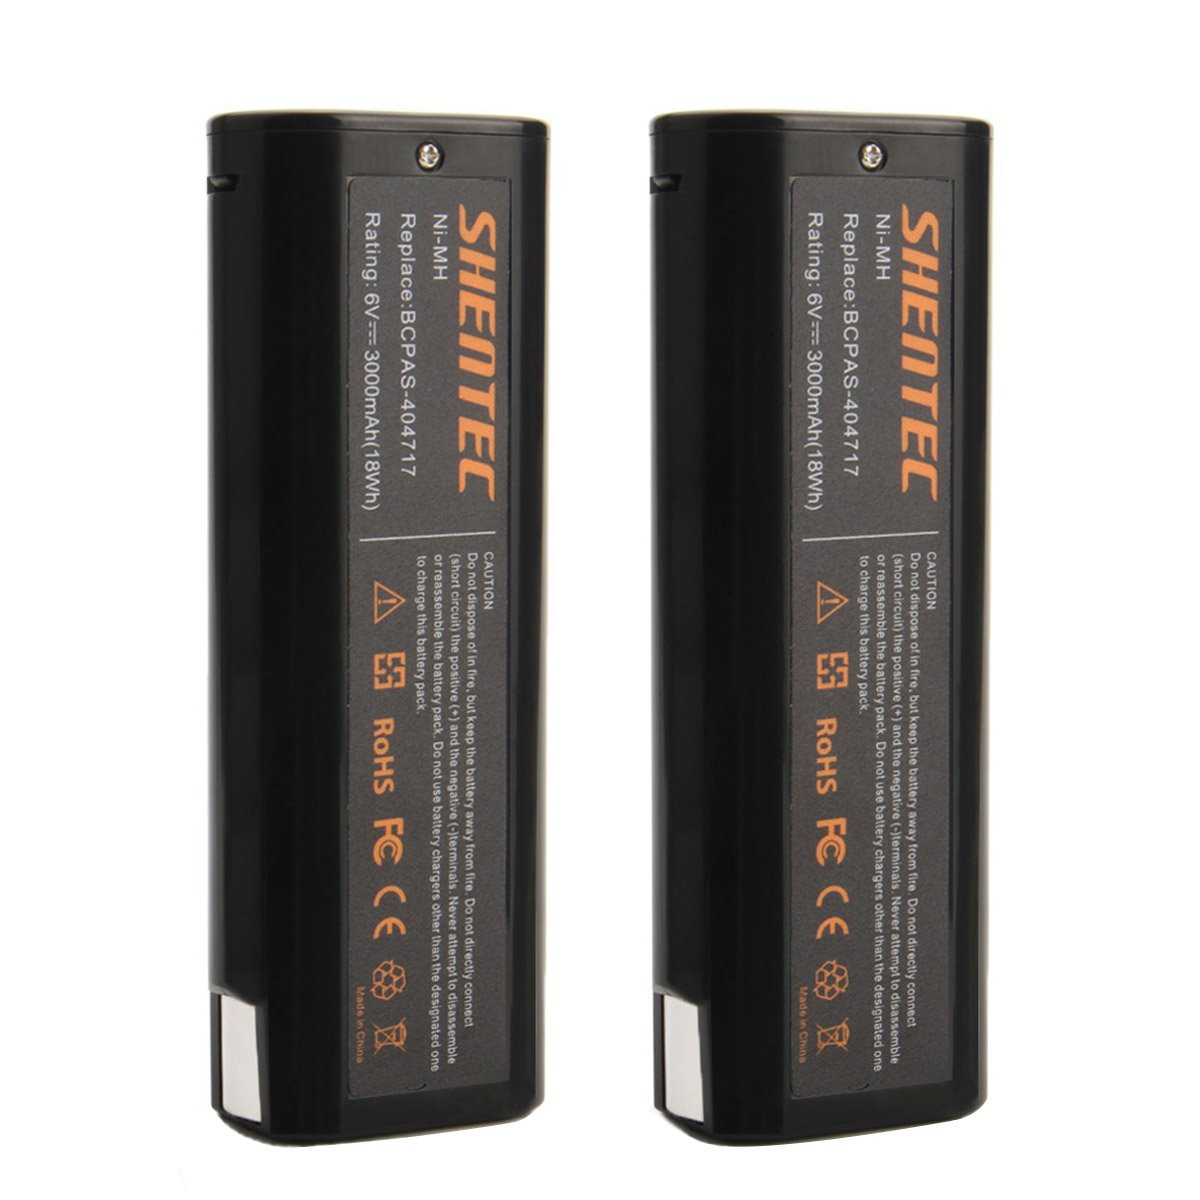 Shentec Upgraded 2-Pack 6V 3.0Ah Battery Compatible with Paslode 404717 B20544E BCPAS-404717 404400 900400 900420 900421 900600 901000 902000 B20720 IM200 F18 IM250 IM250A IM350A PS604N, Ni-MH